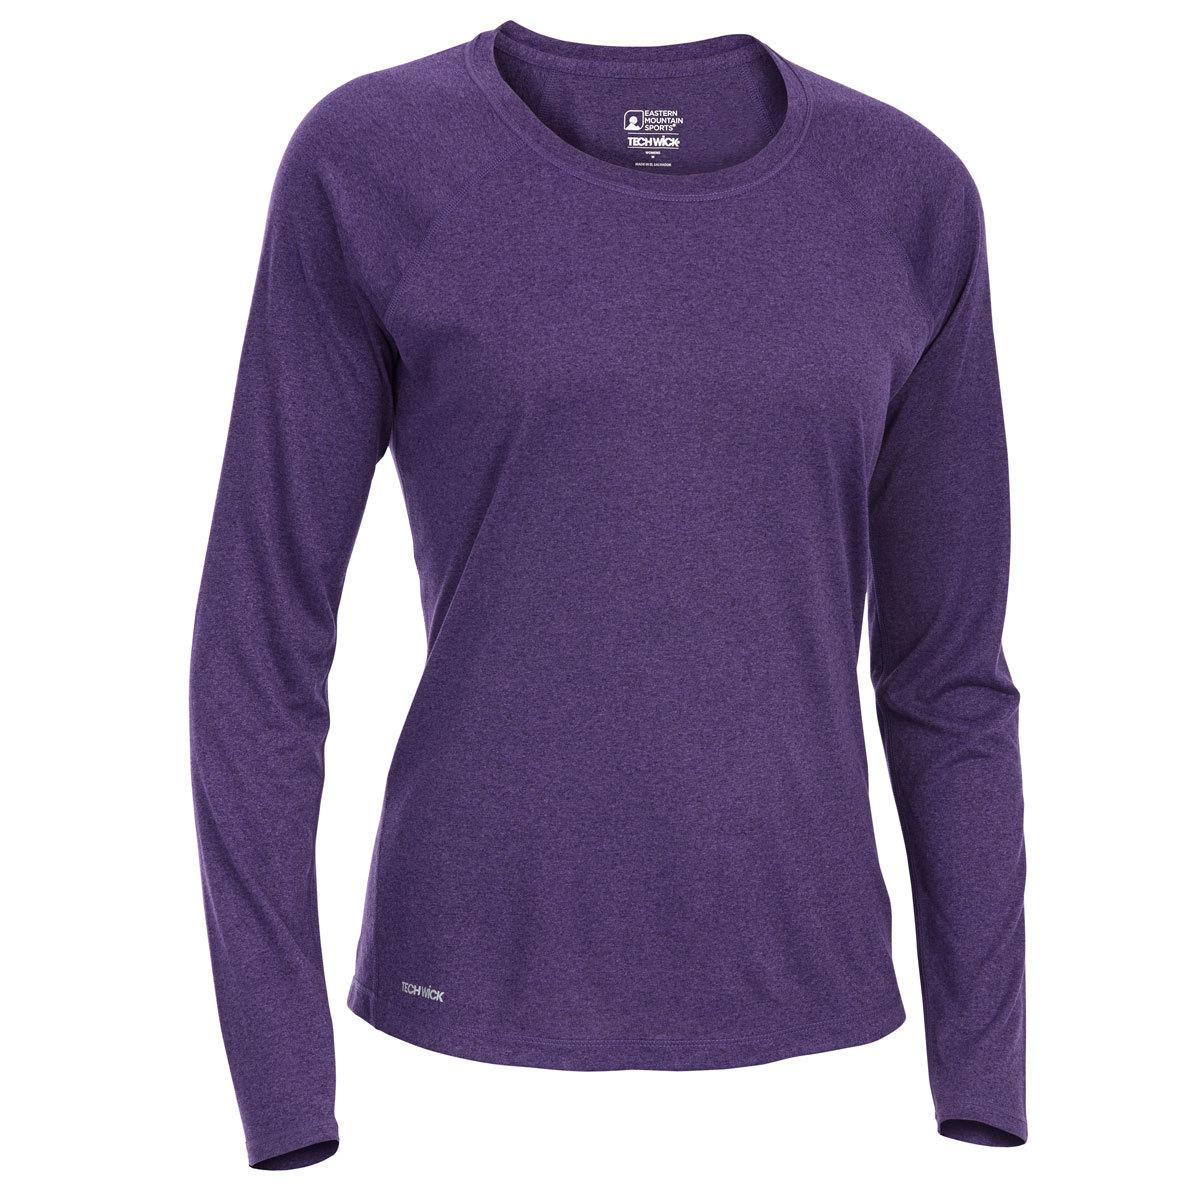 Ems Women's Techwick Essence Crew Long-Sleeve Shirt - Purple, L